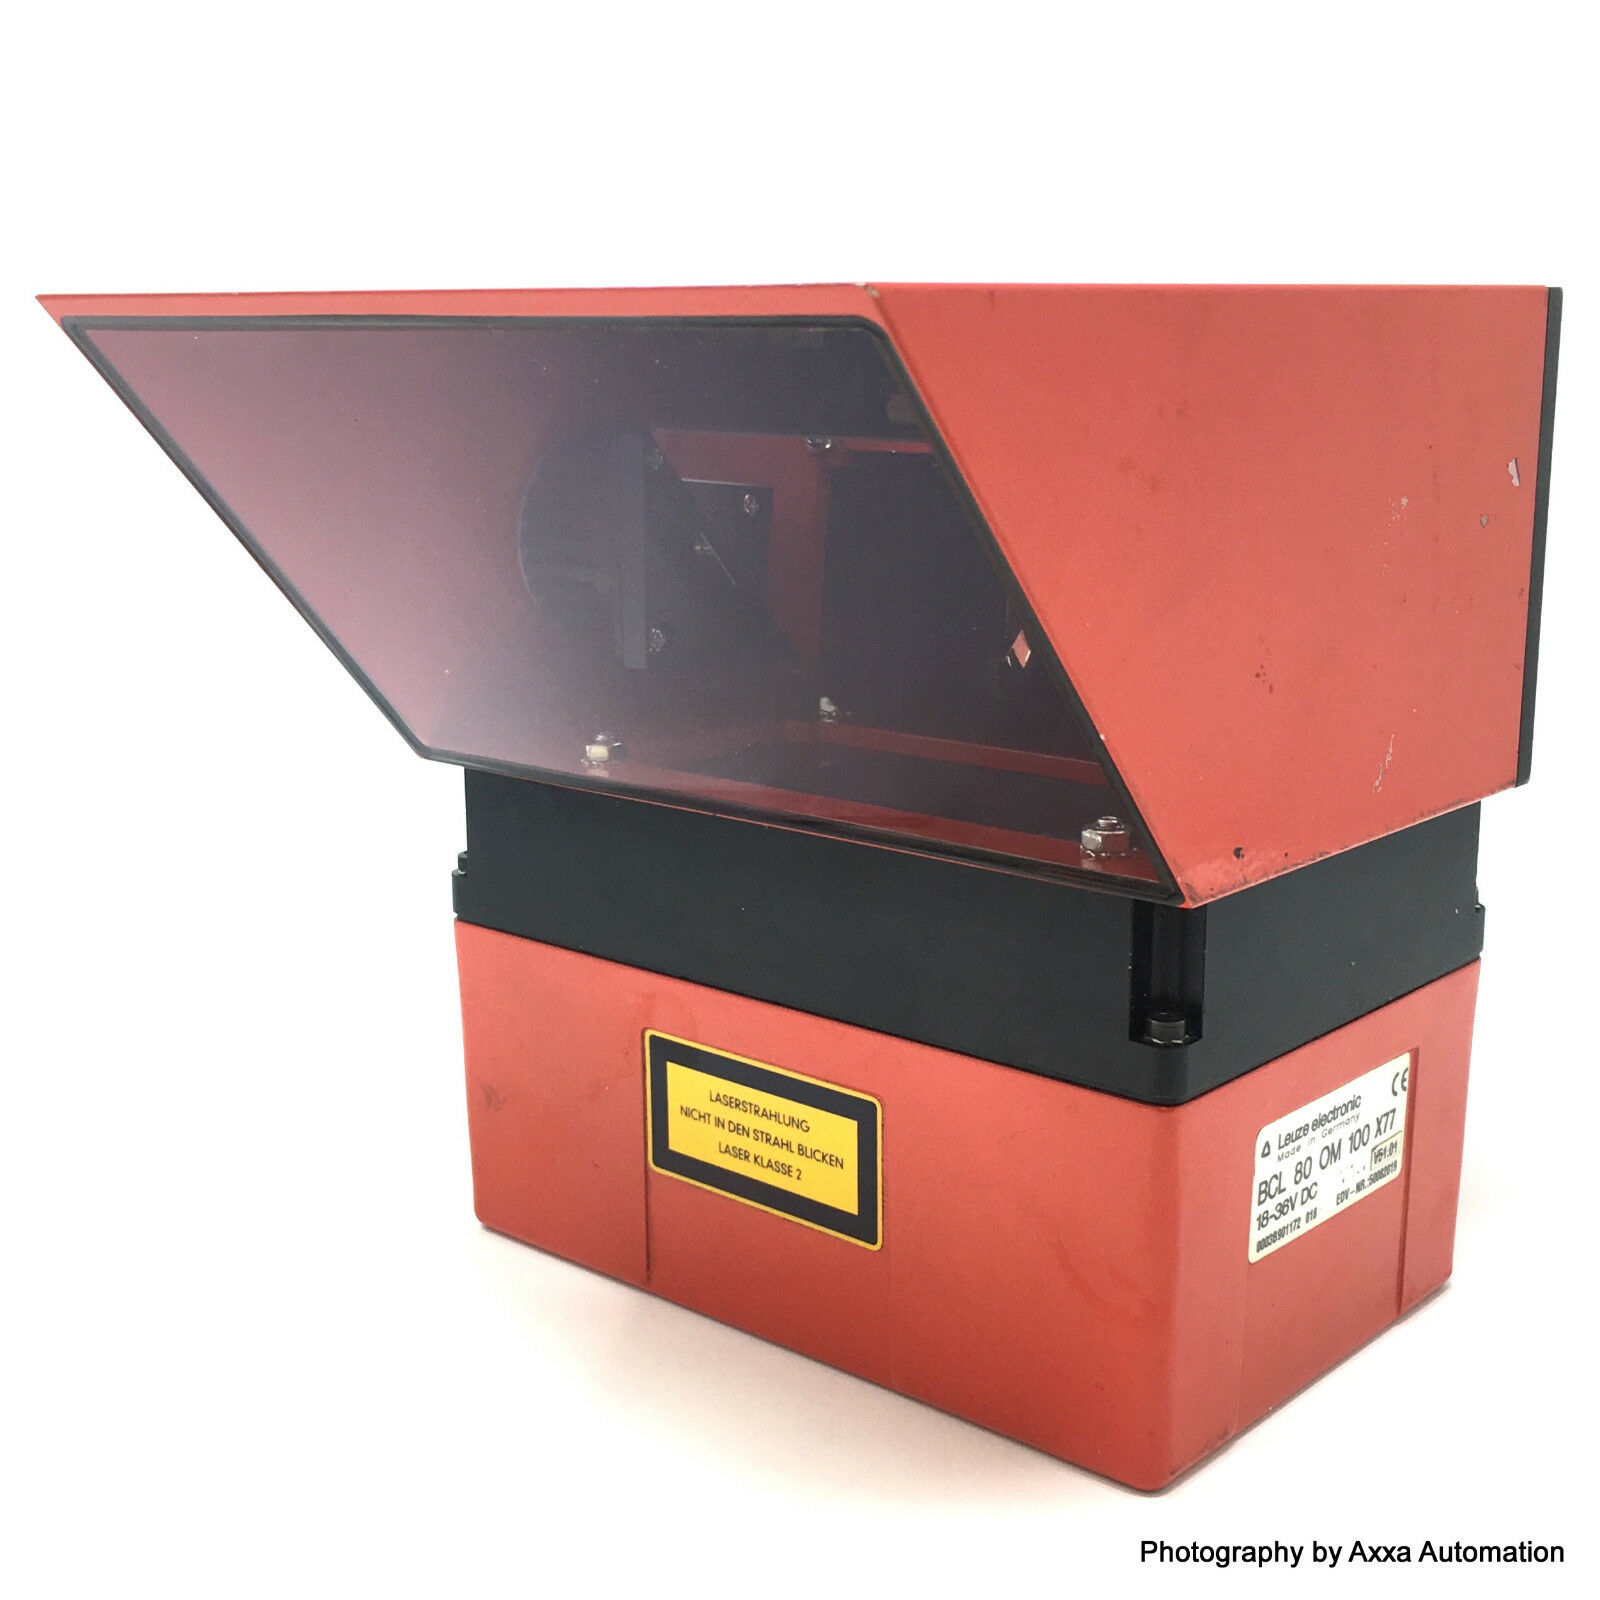 REPLACEMENT FOR 24V 2.5A EA10681P-240 AC Adattatore per TSC DA200 STAMPANTE CODICE A BARRE